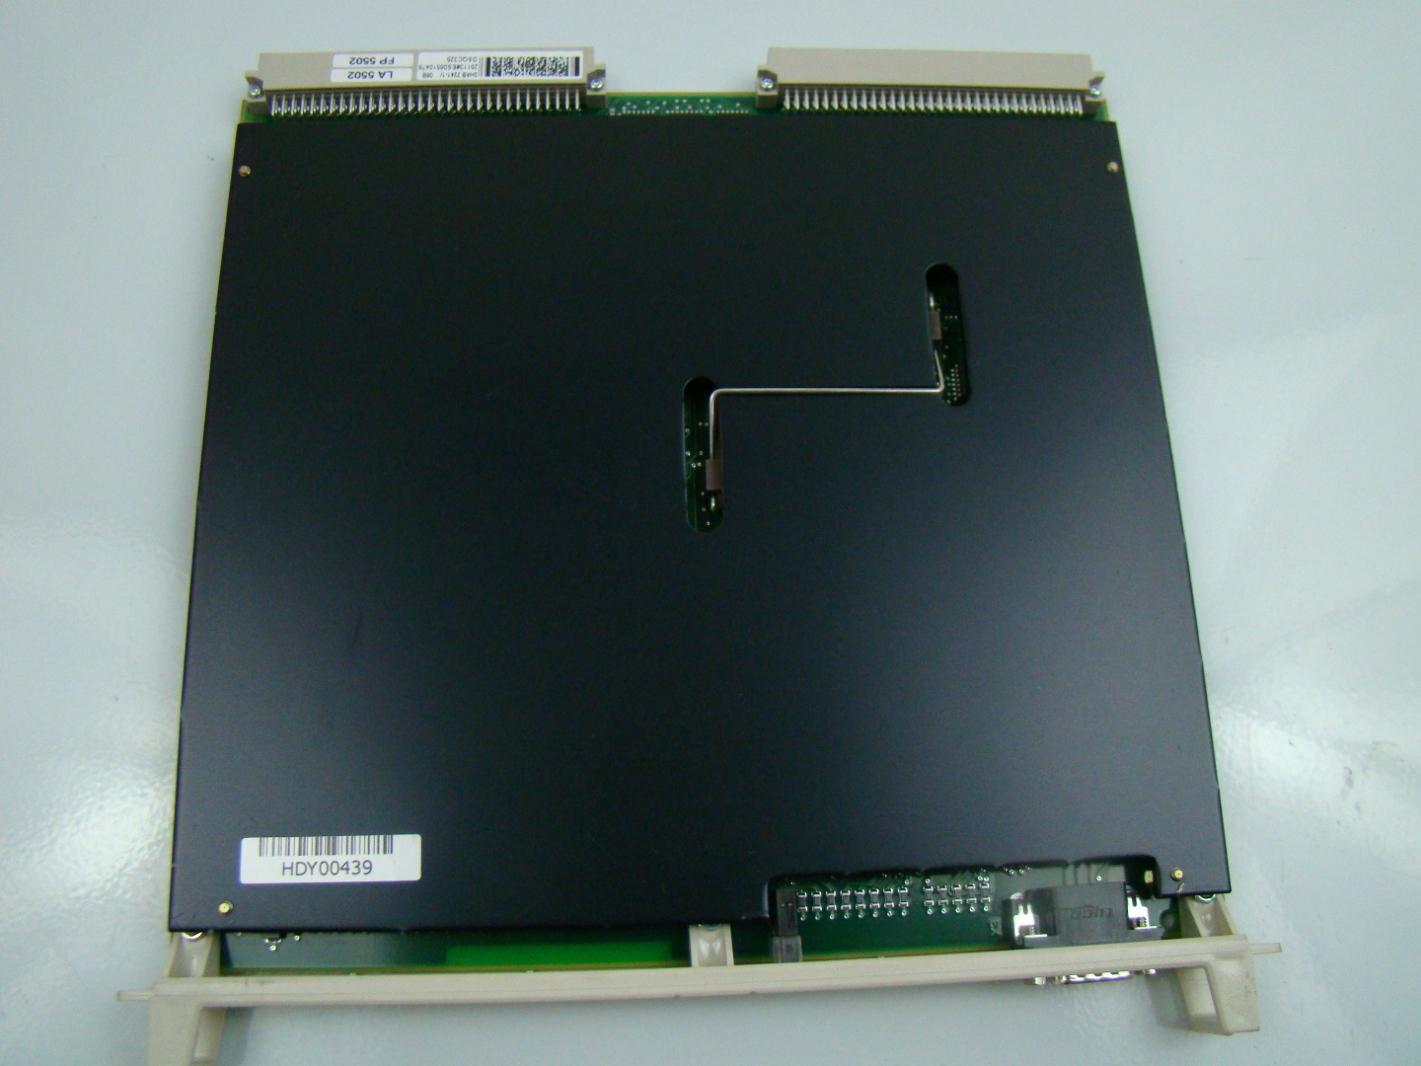 Details about ABB Robotics 3HAB2241-1 CPU Board